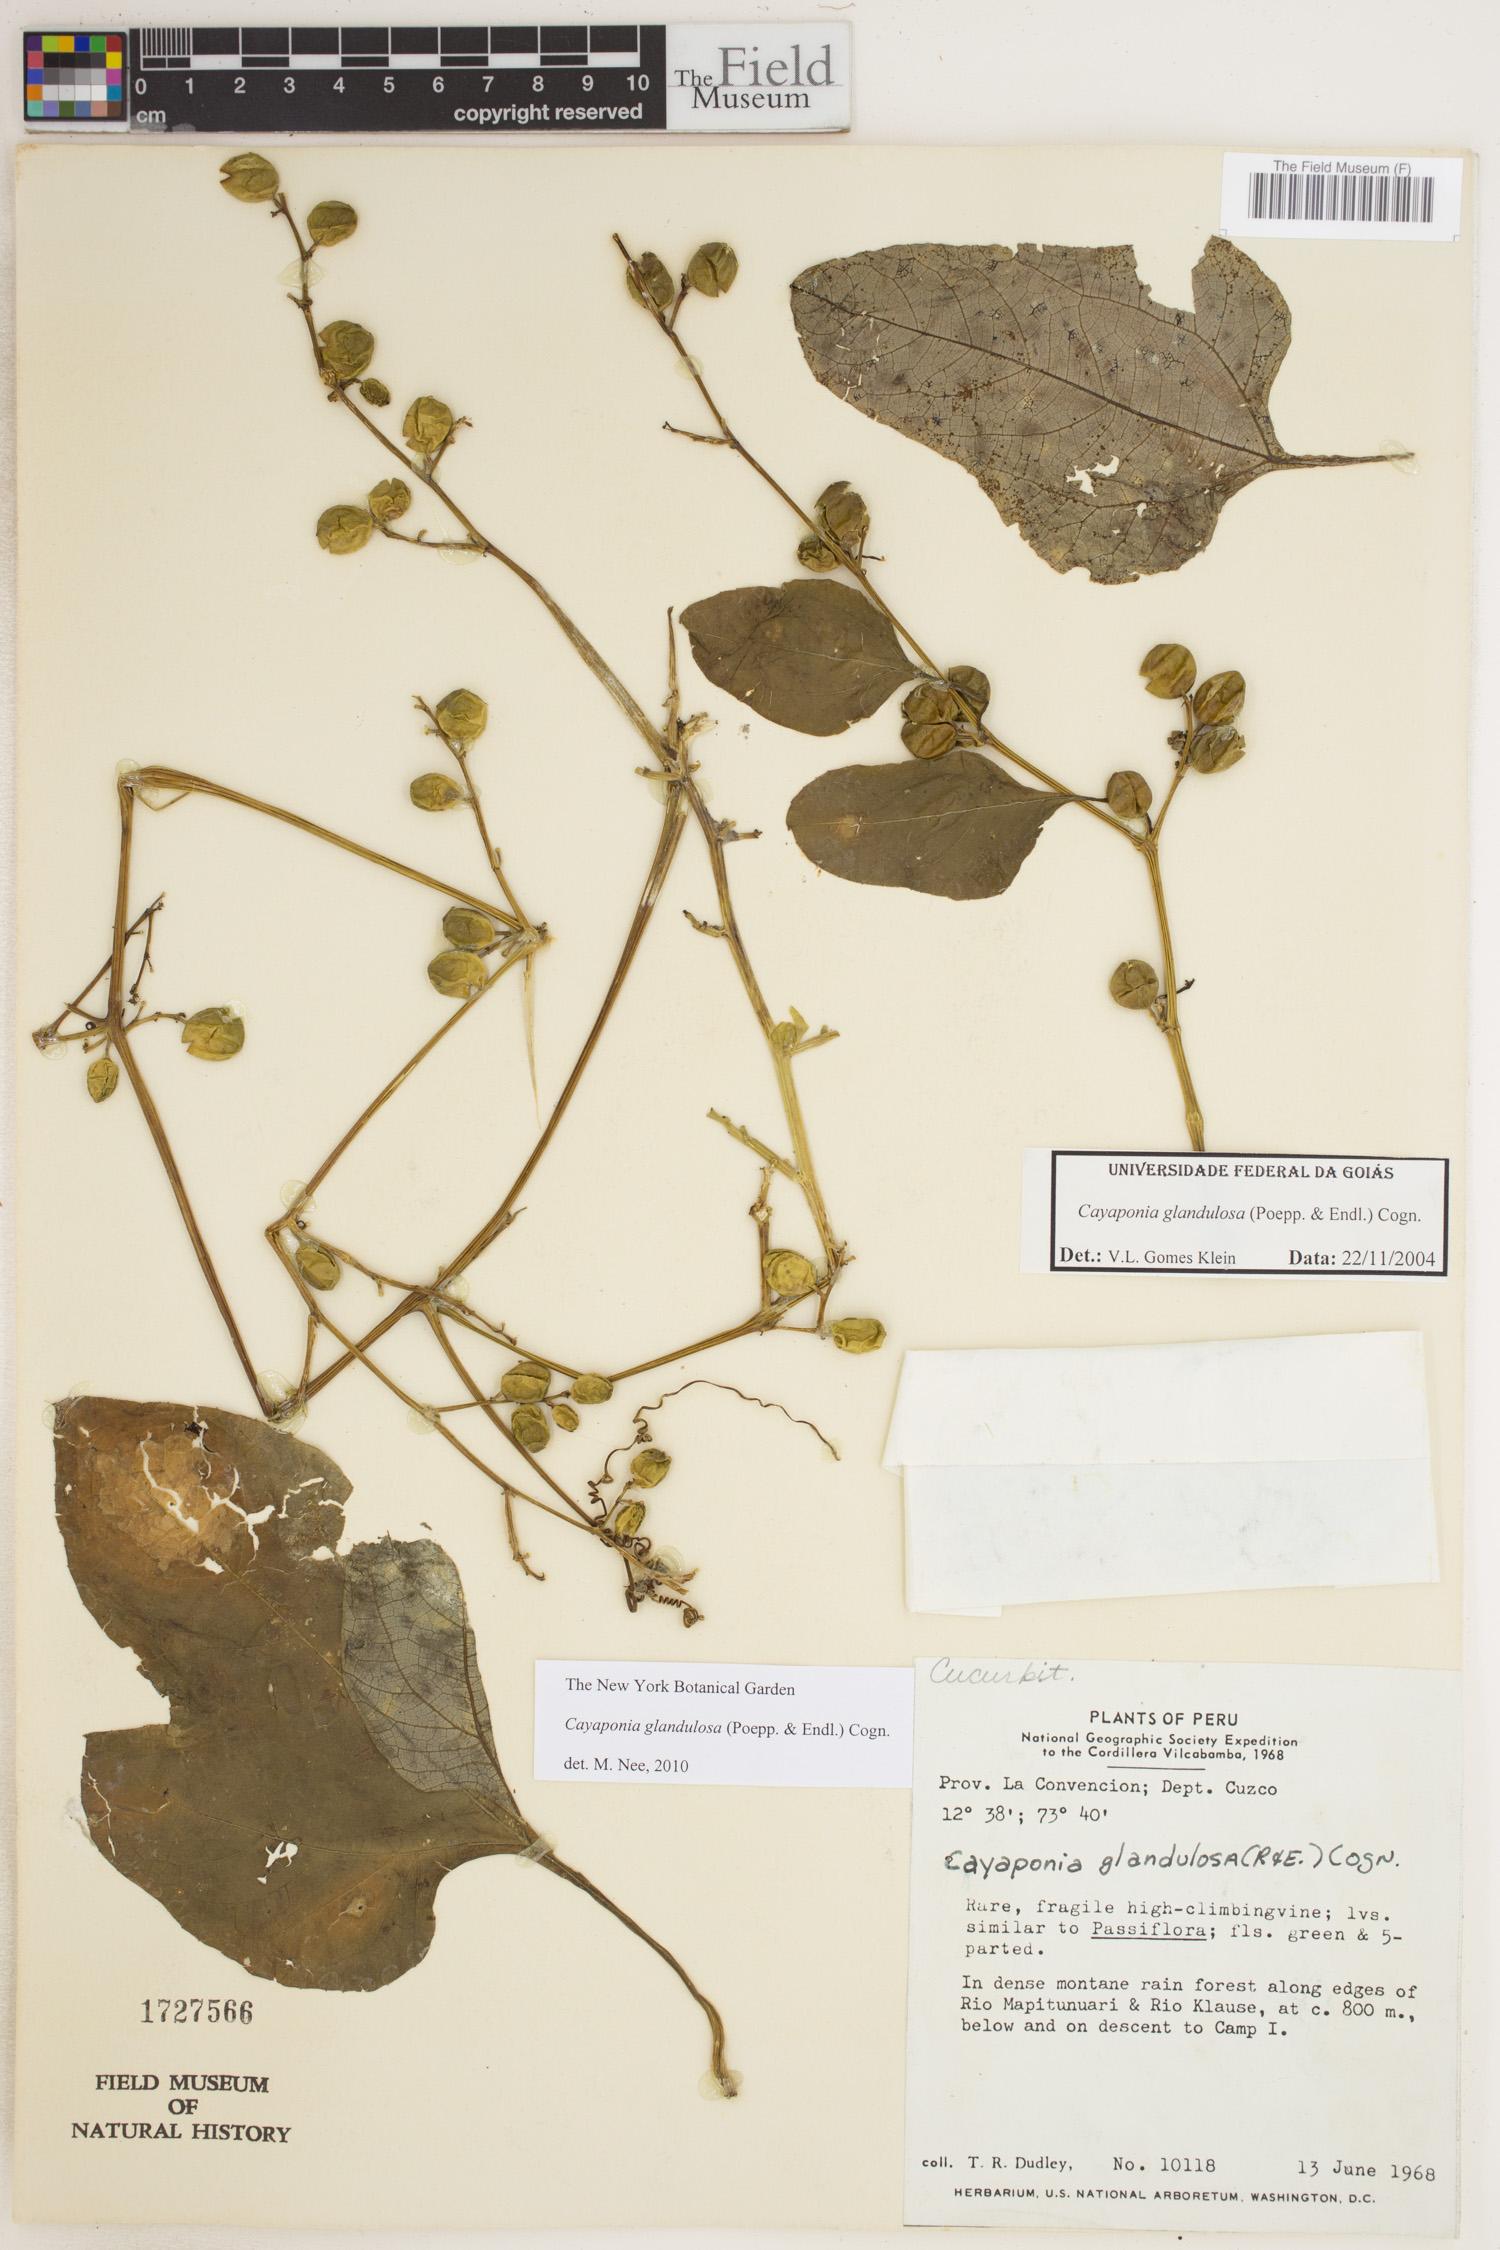 Cayaponia glandulosa image